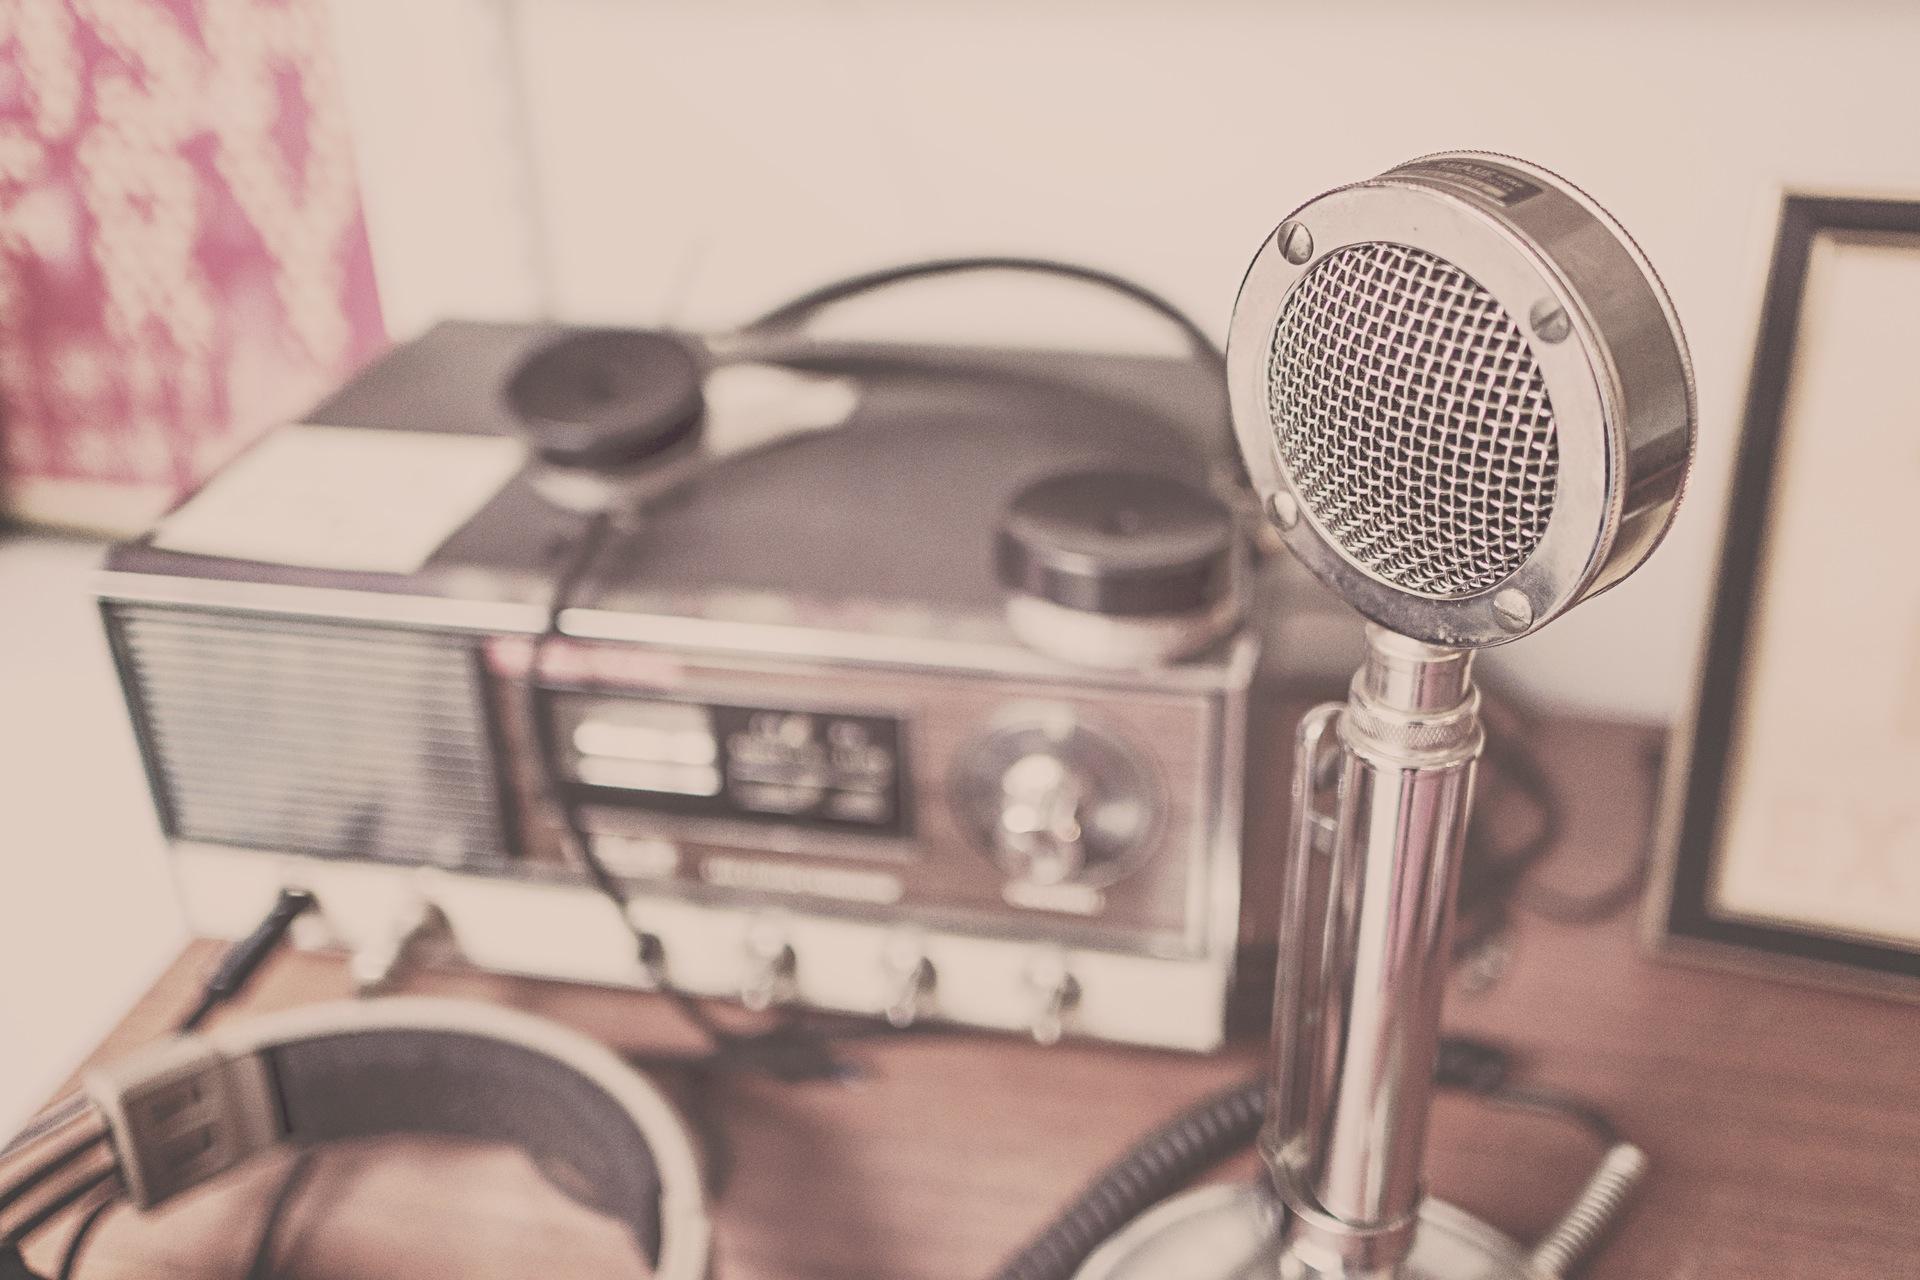 Radio, microfono, altoparlante, suono, audio, vintage, vecchio - Sfondi HD - Professor-falken.com